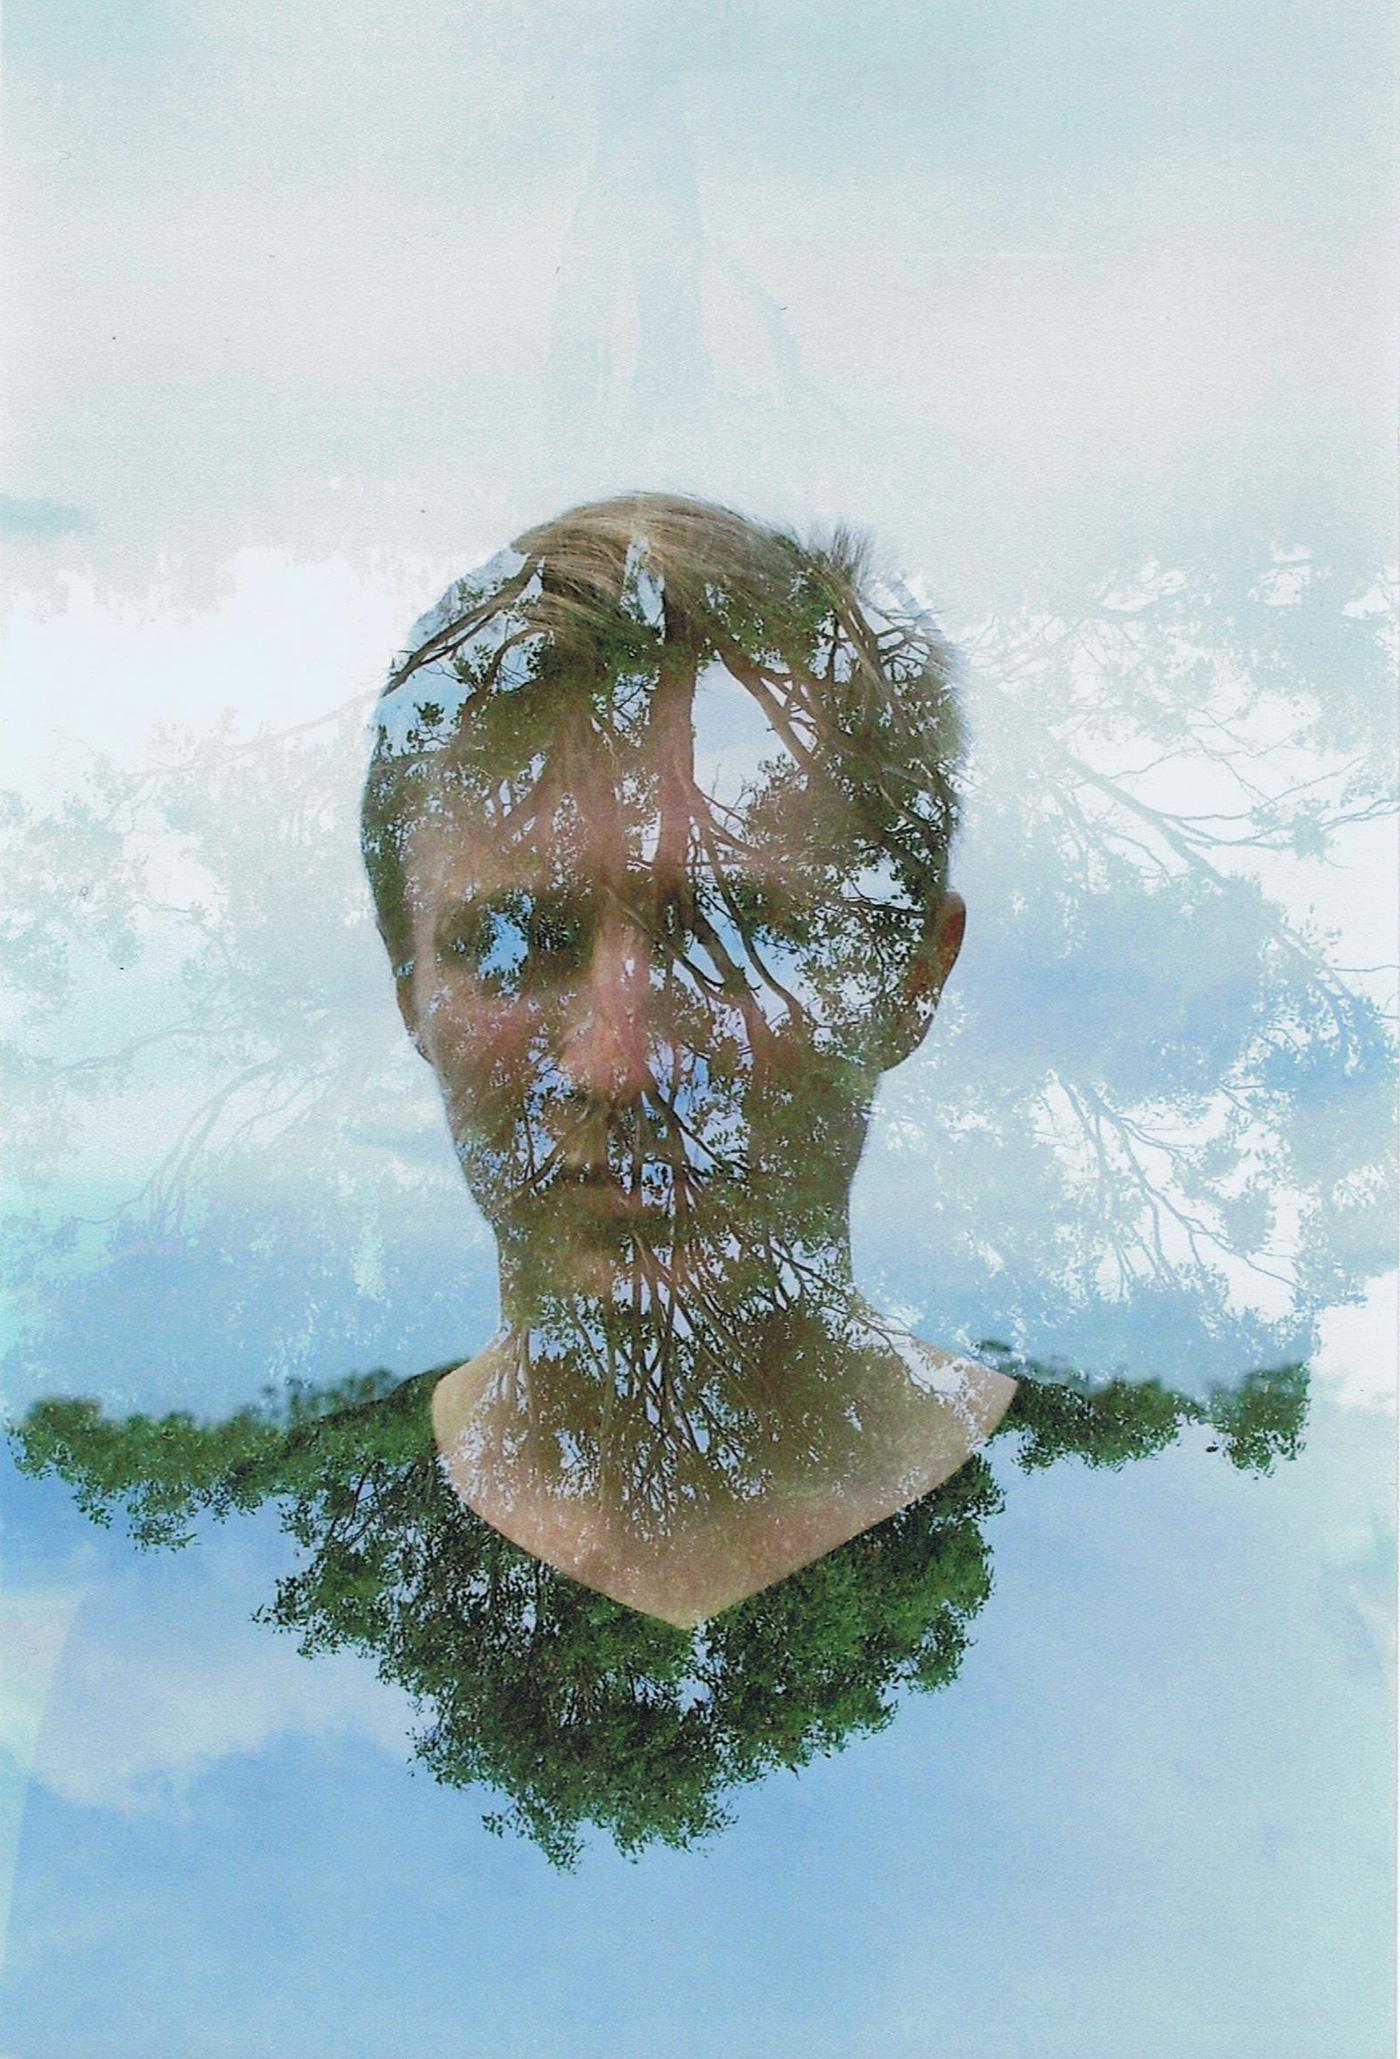 Double Exposure Self Portraits   Film on Behance